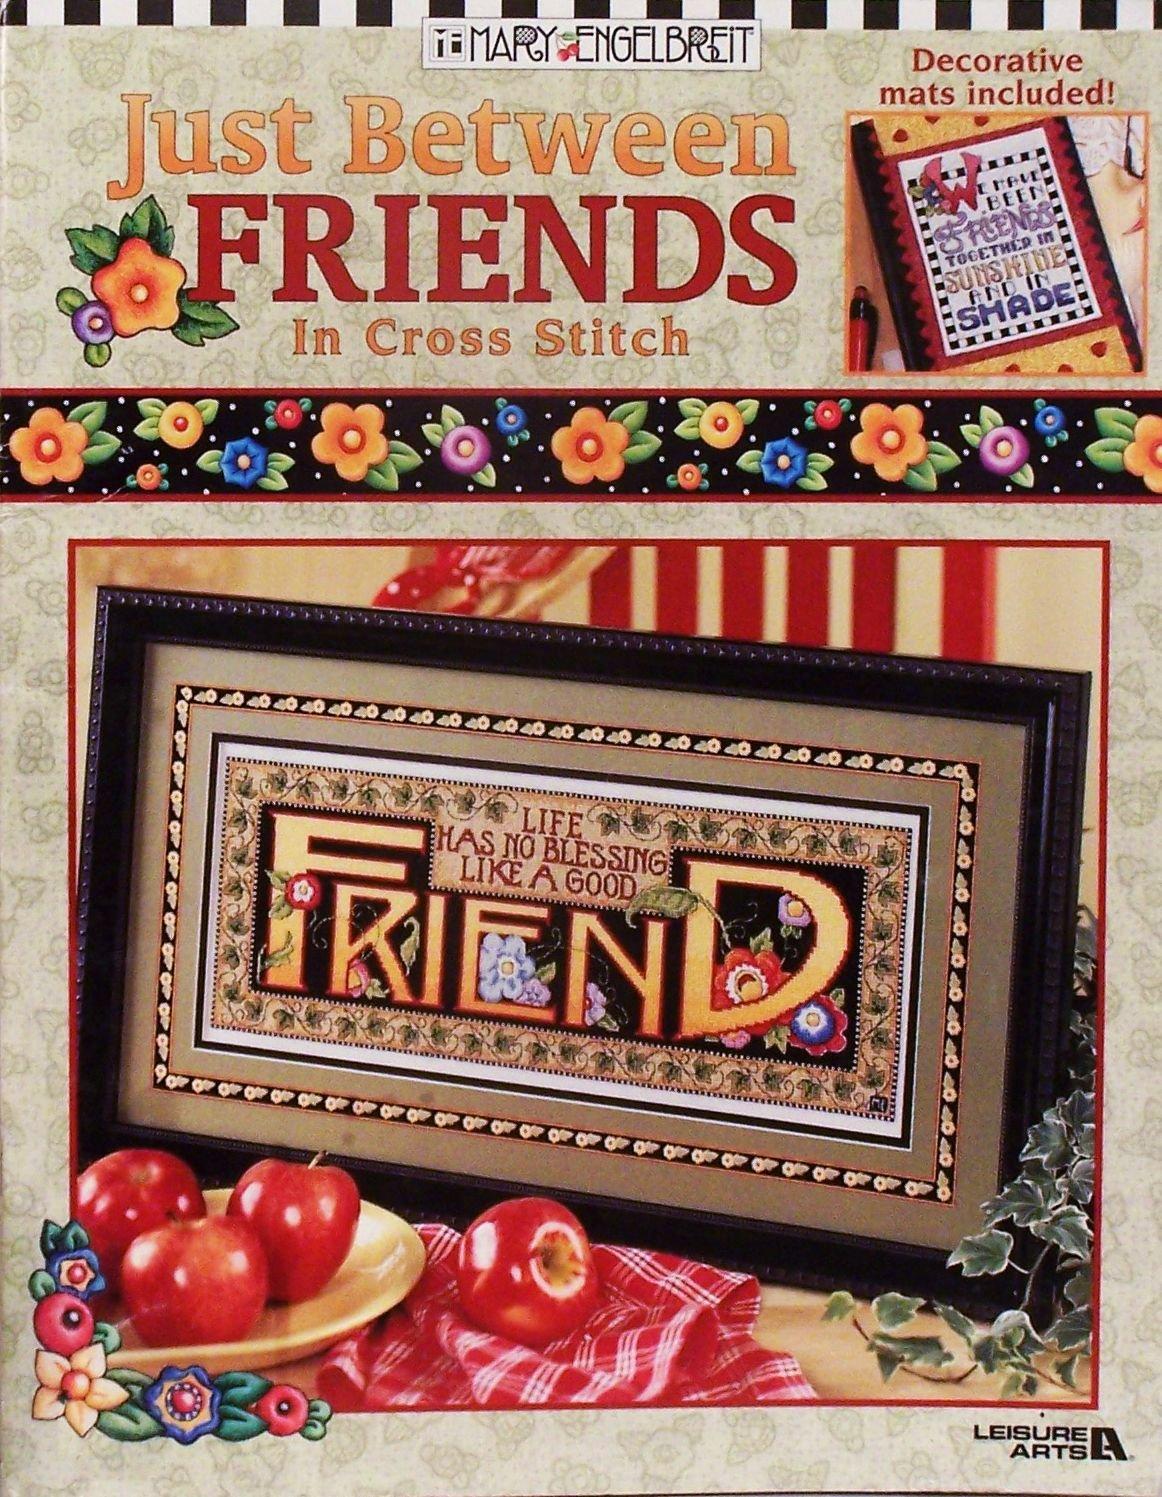 Just Between Friends  in Cross Stitch Mary Engelbreit